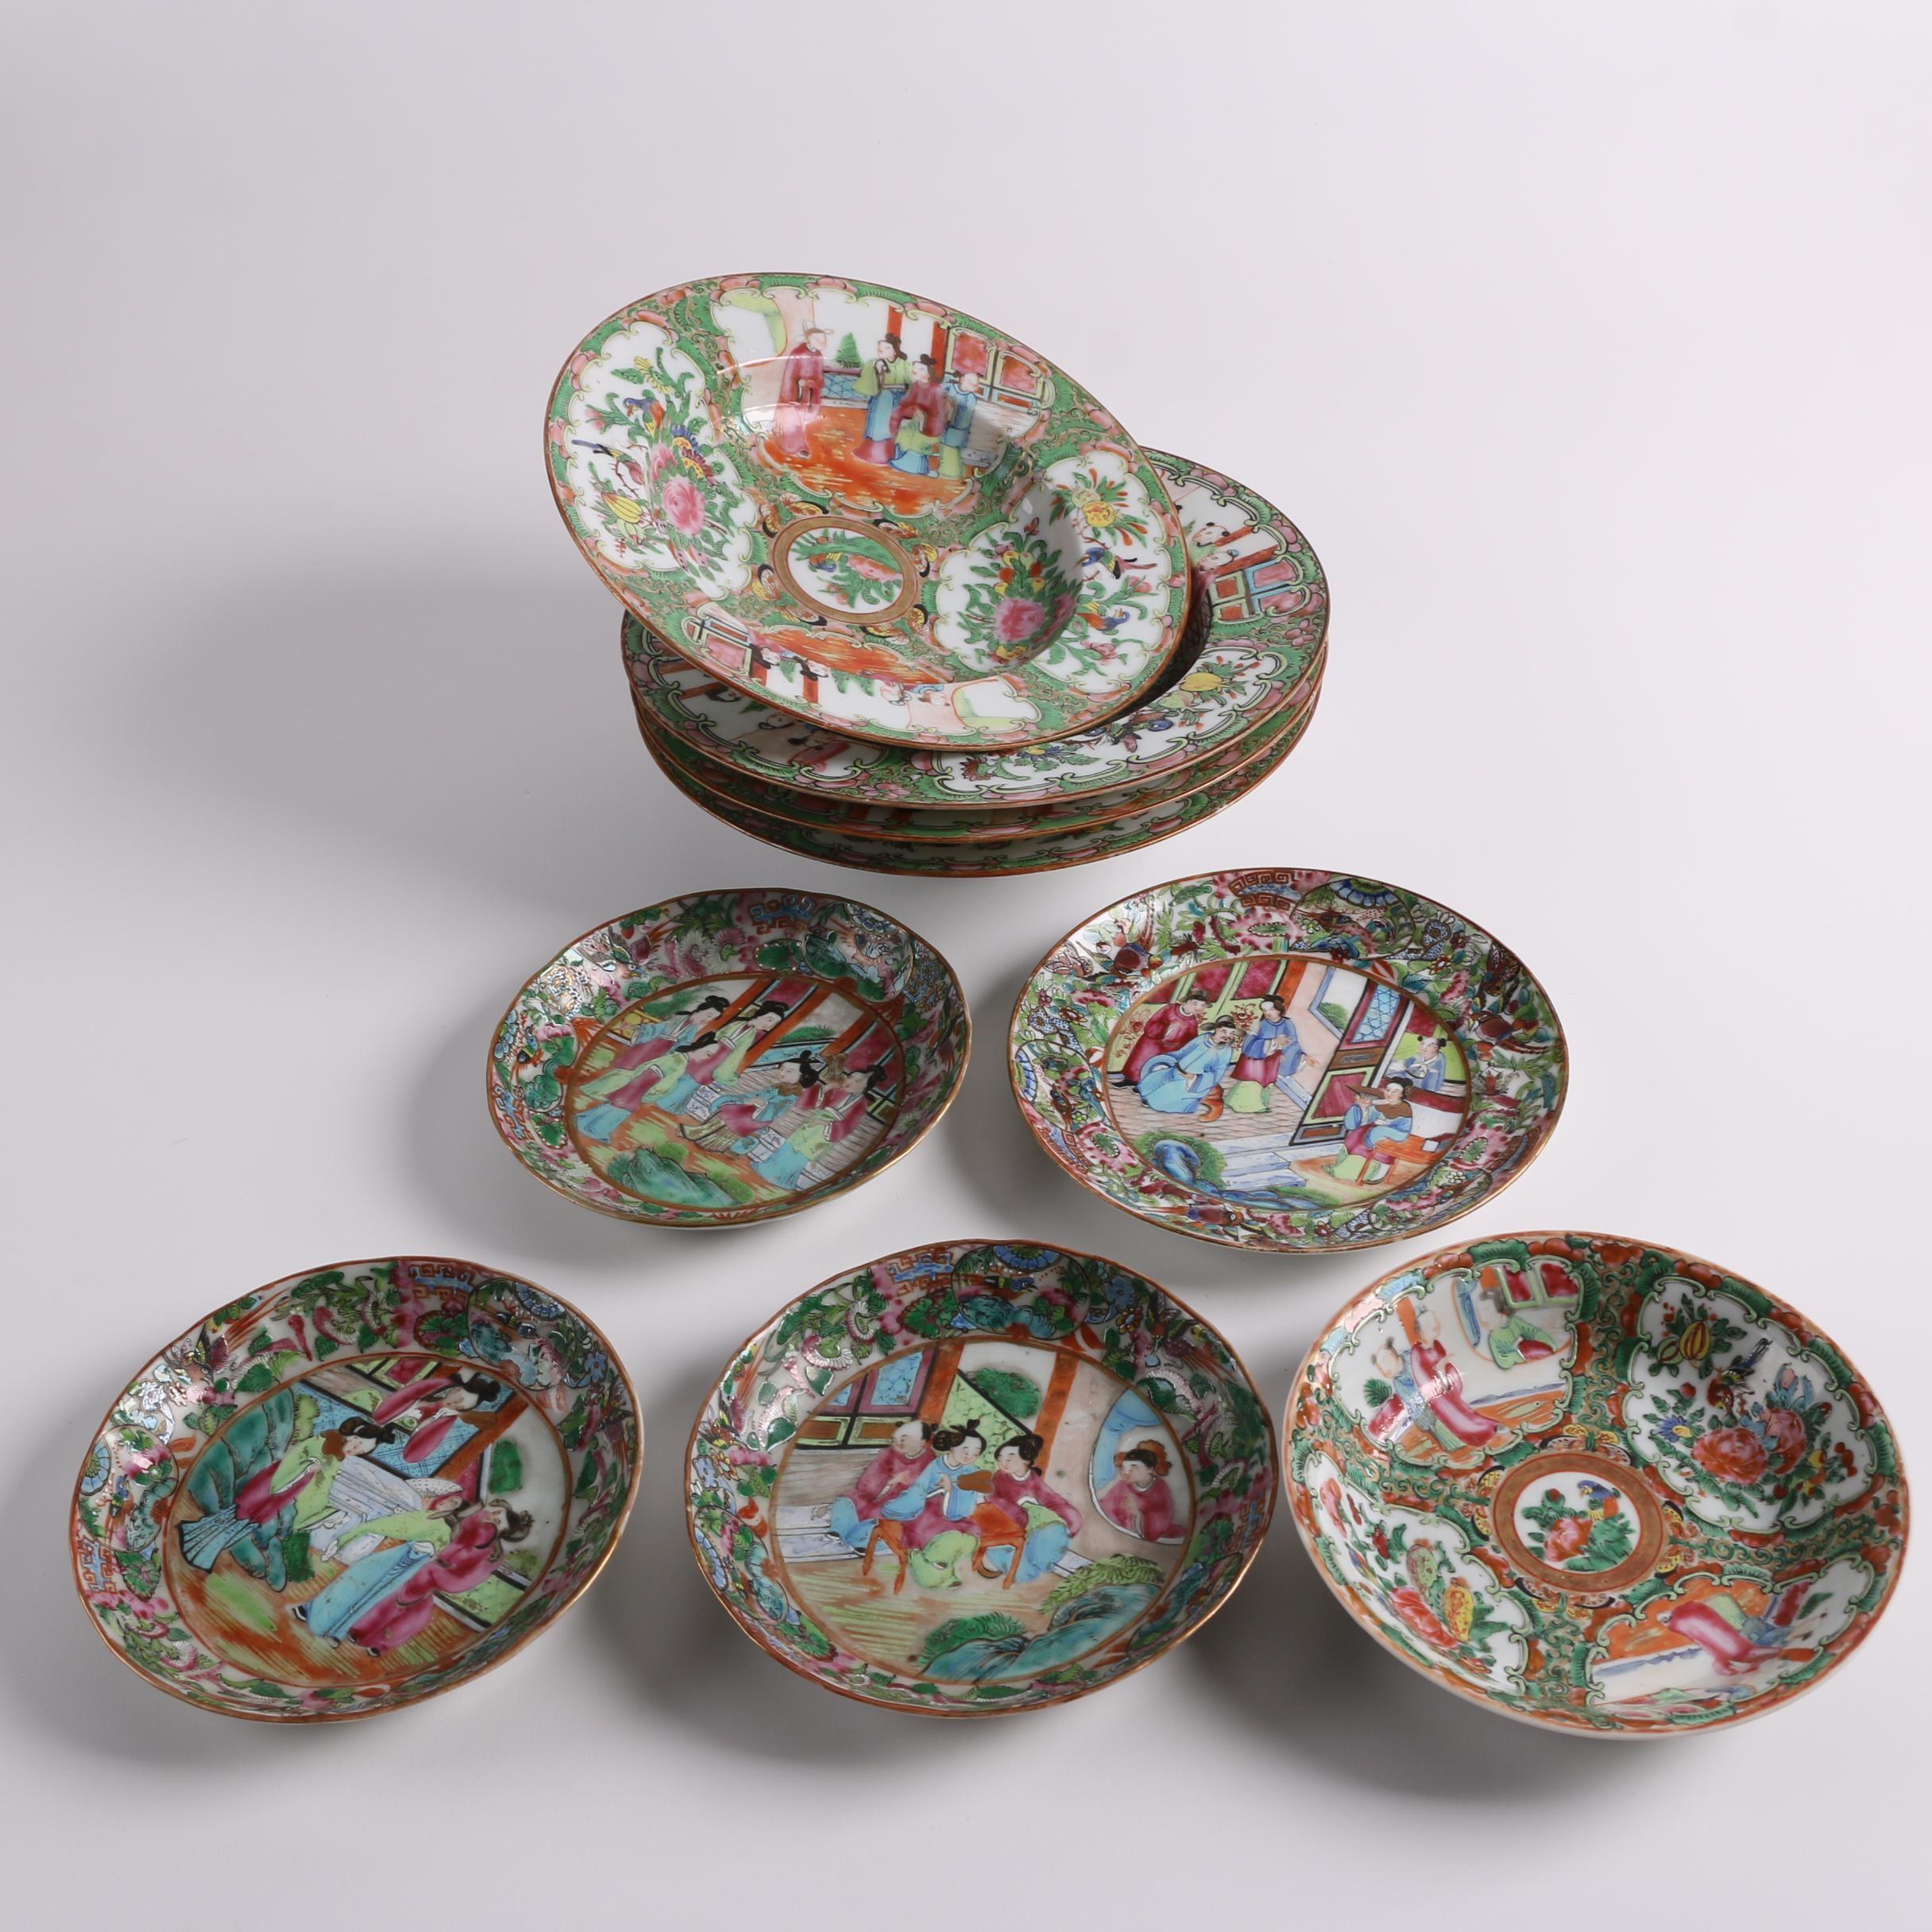 Antique Chinese Rose Mandarin and Rose Medallion Porcelain Dinnerware